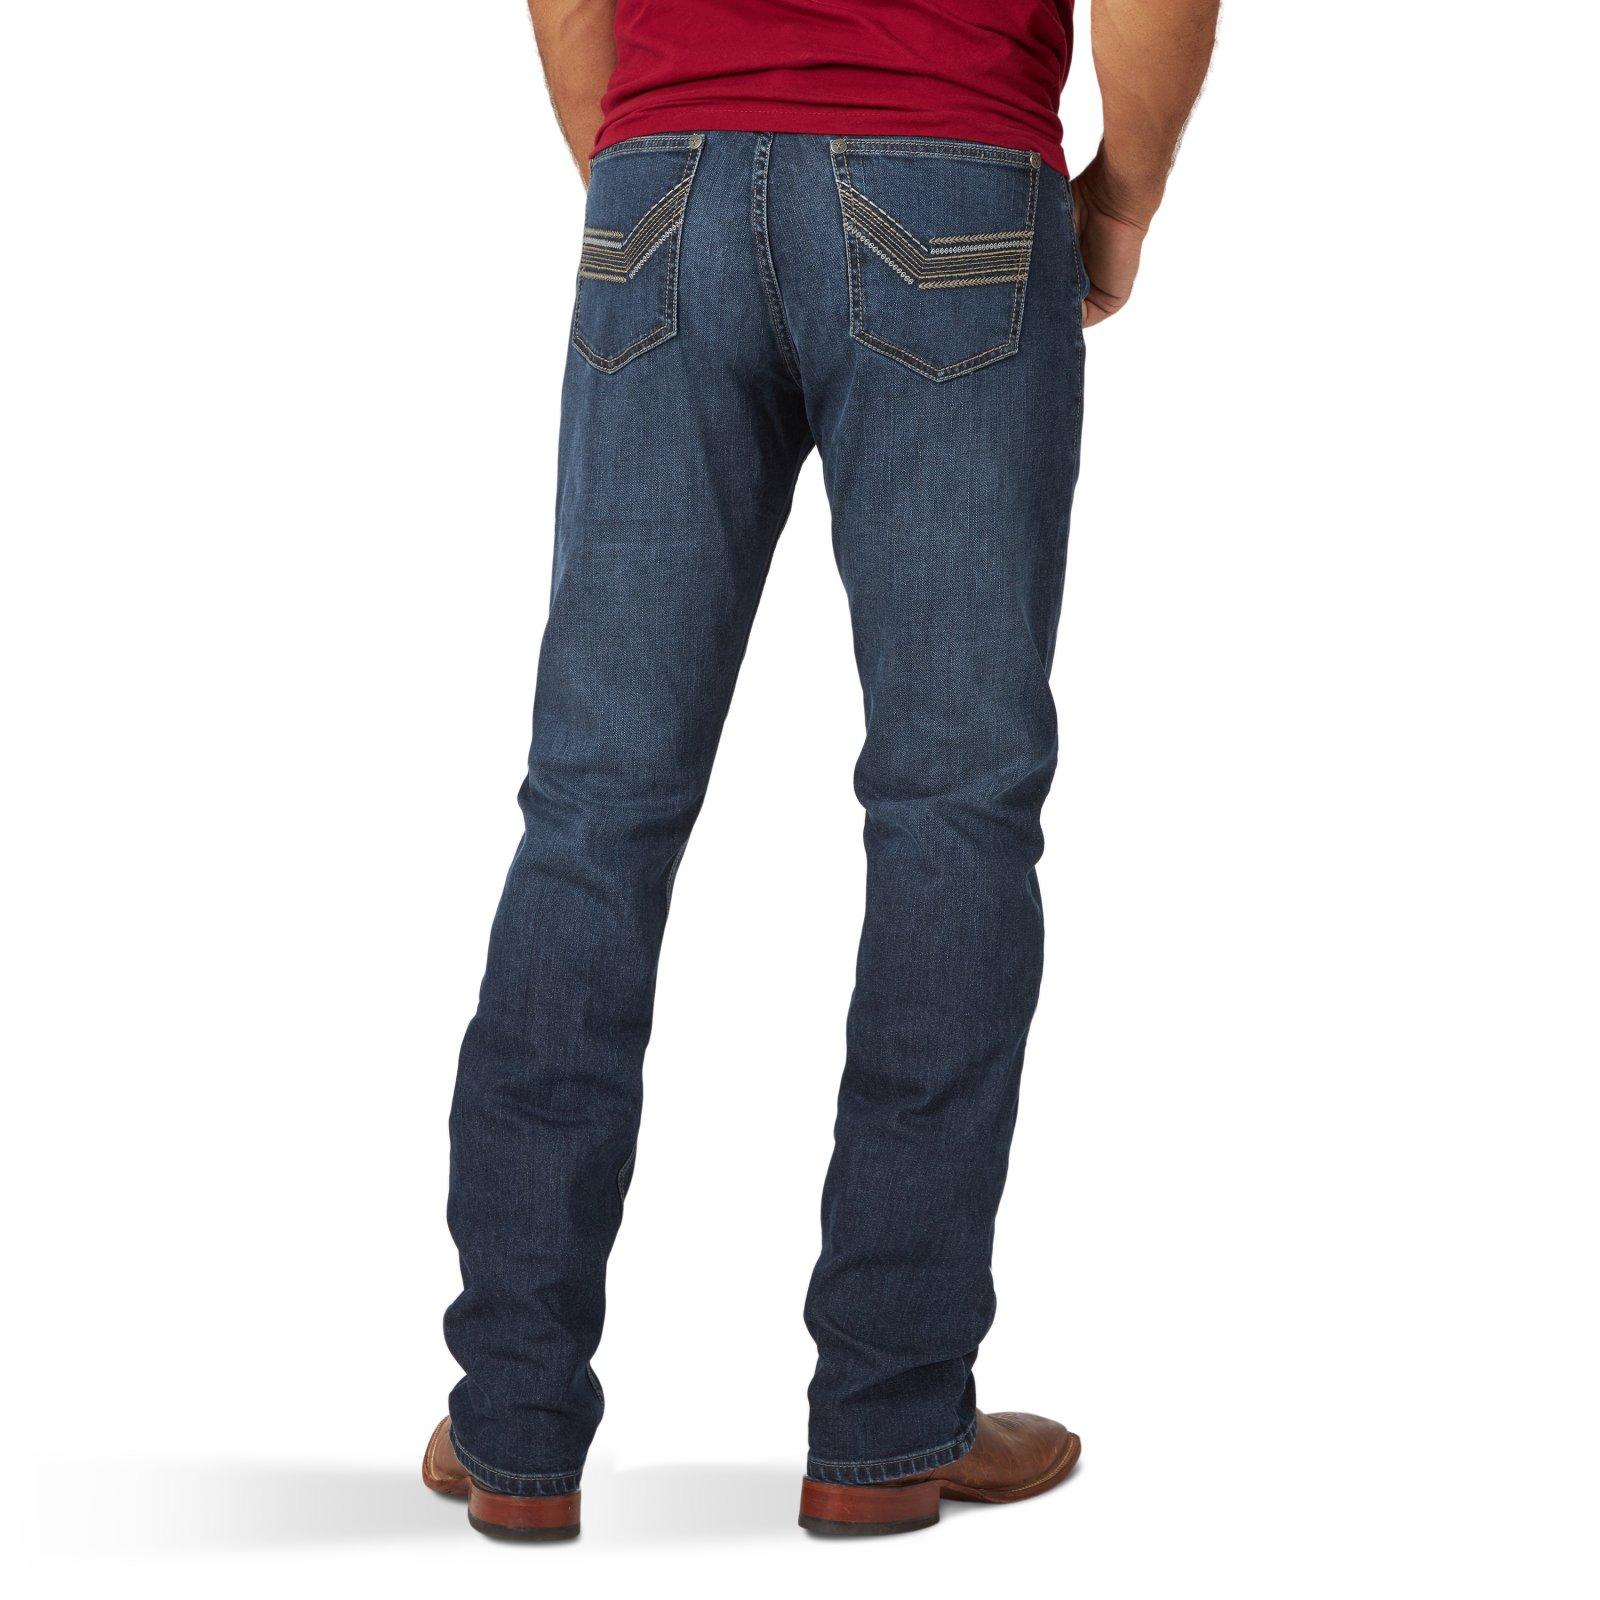 20X No. 44 Slim Straight Jean from Wrangler